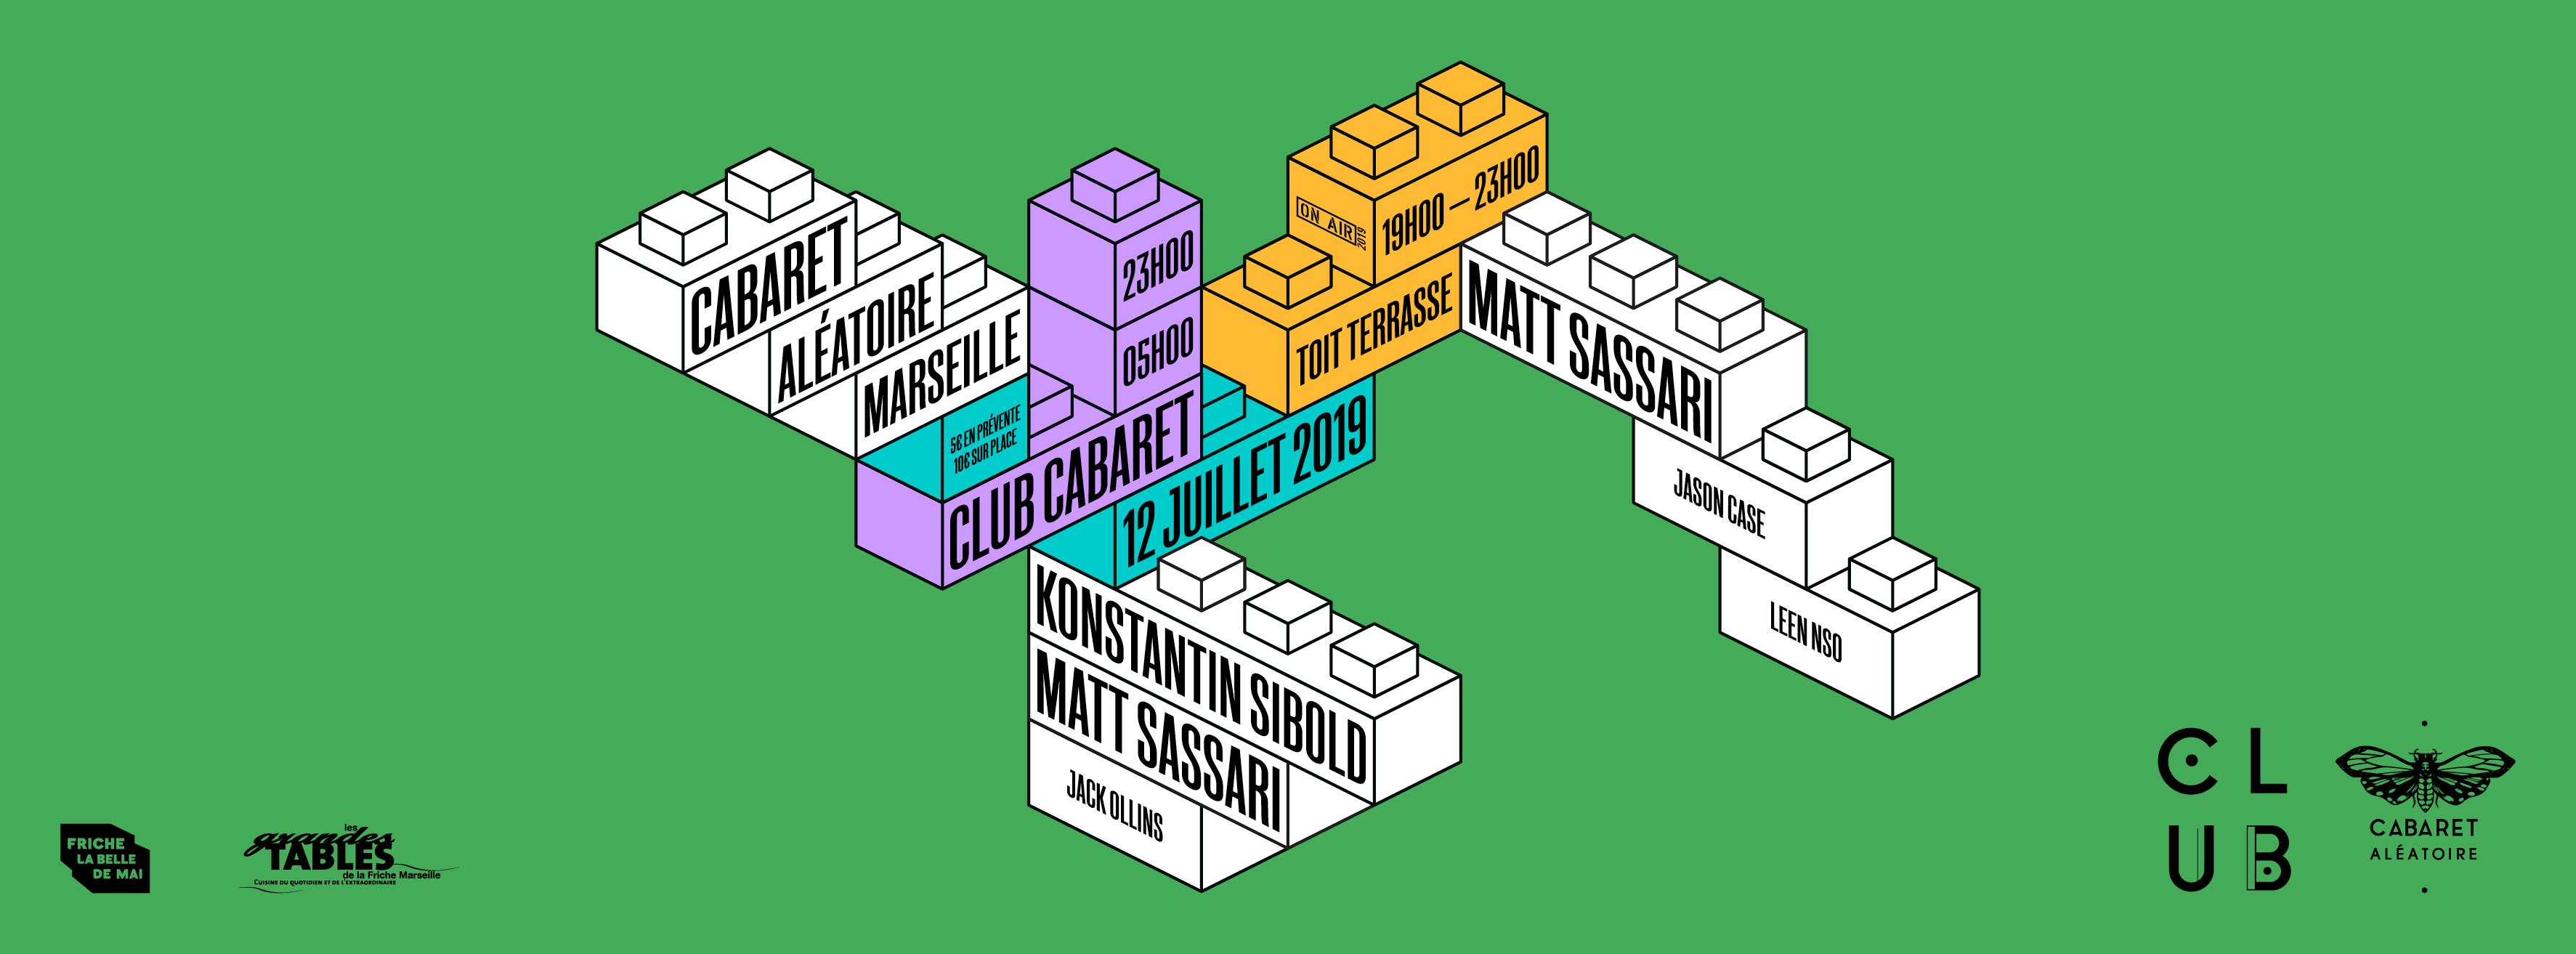 Club Cabaret X : Jack Ollins + Konstantin Sibold + Matt Sassari